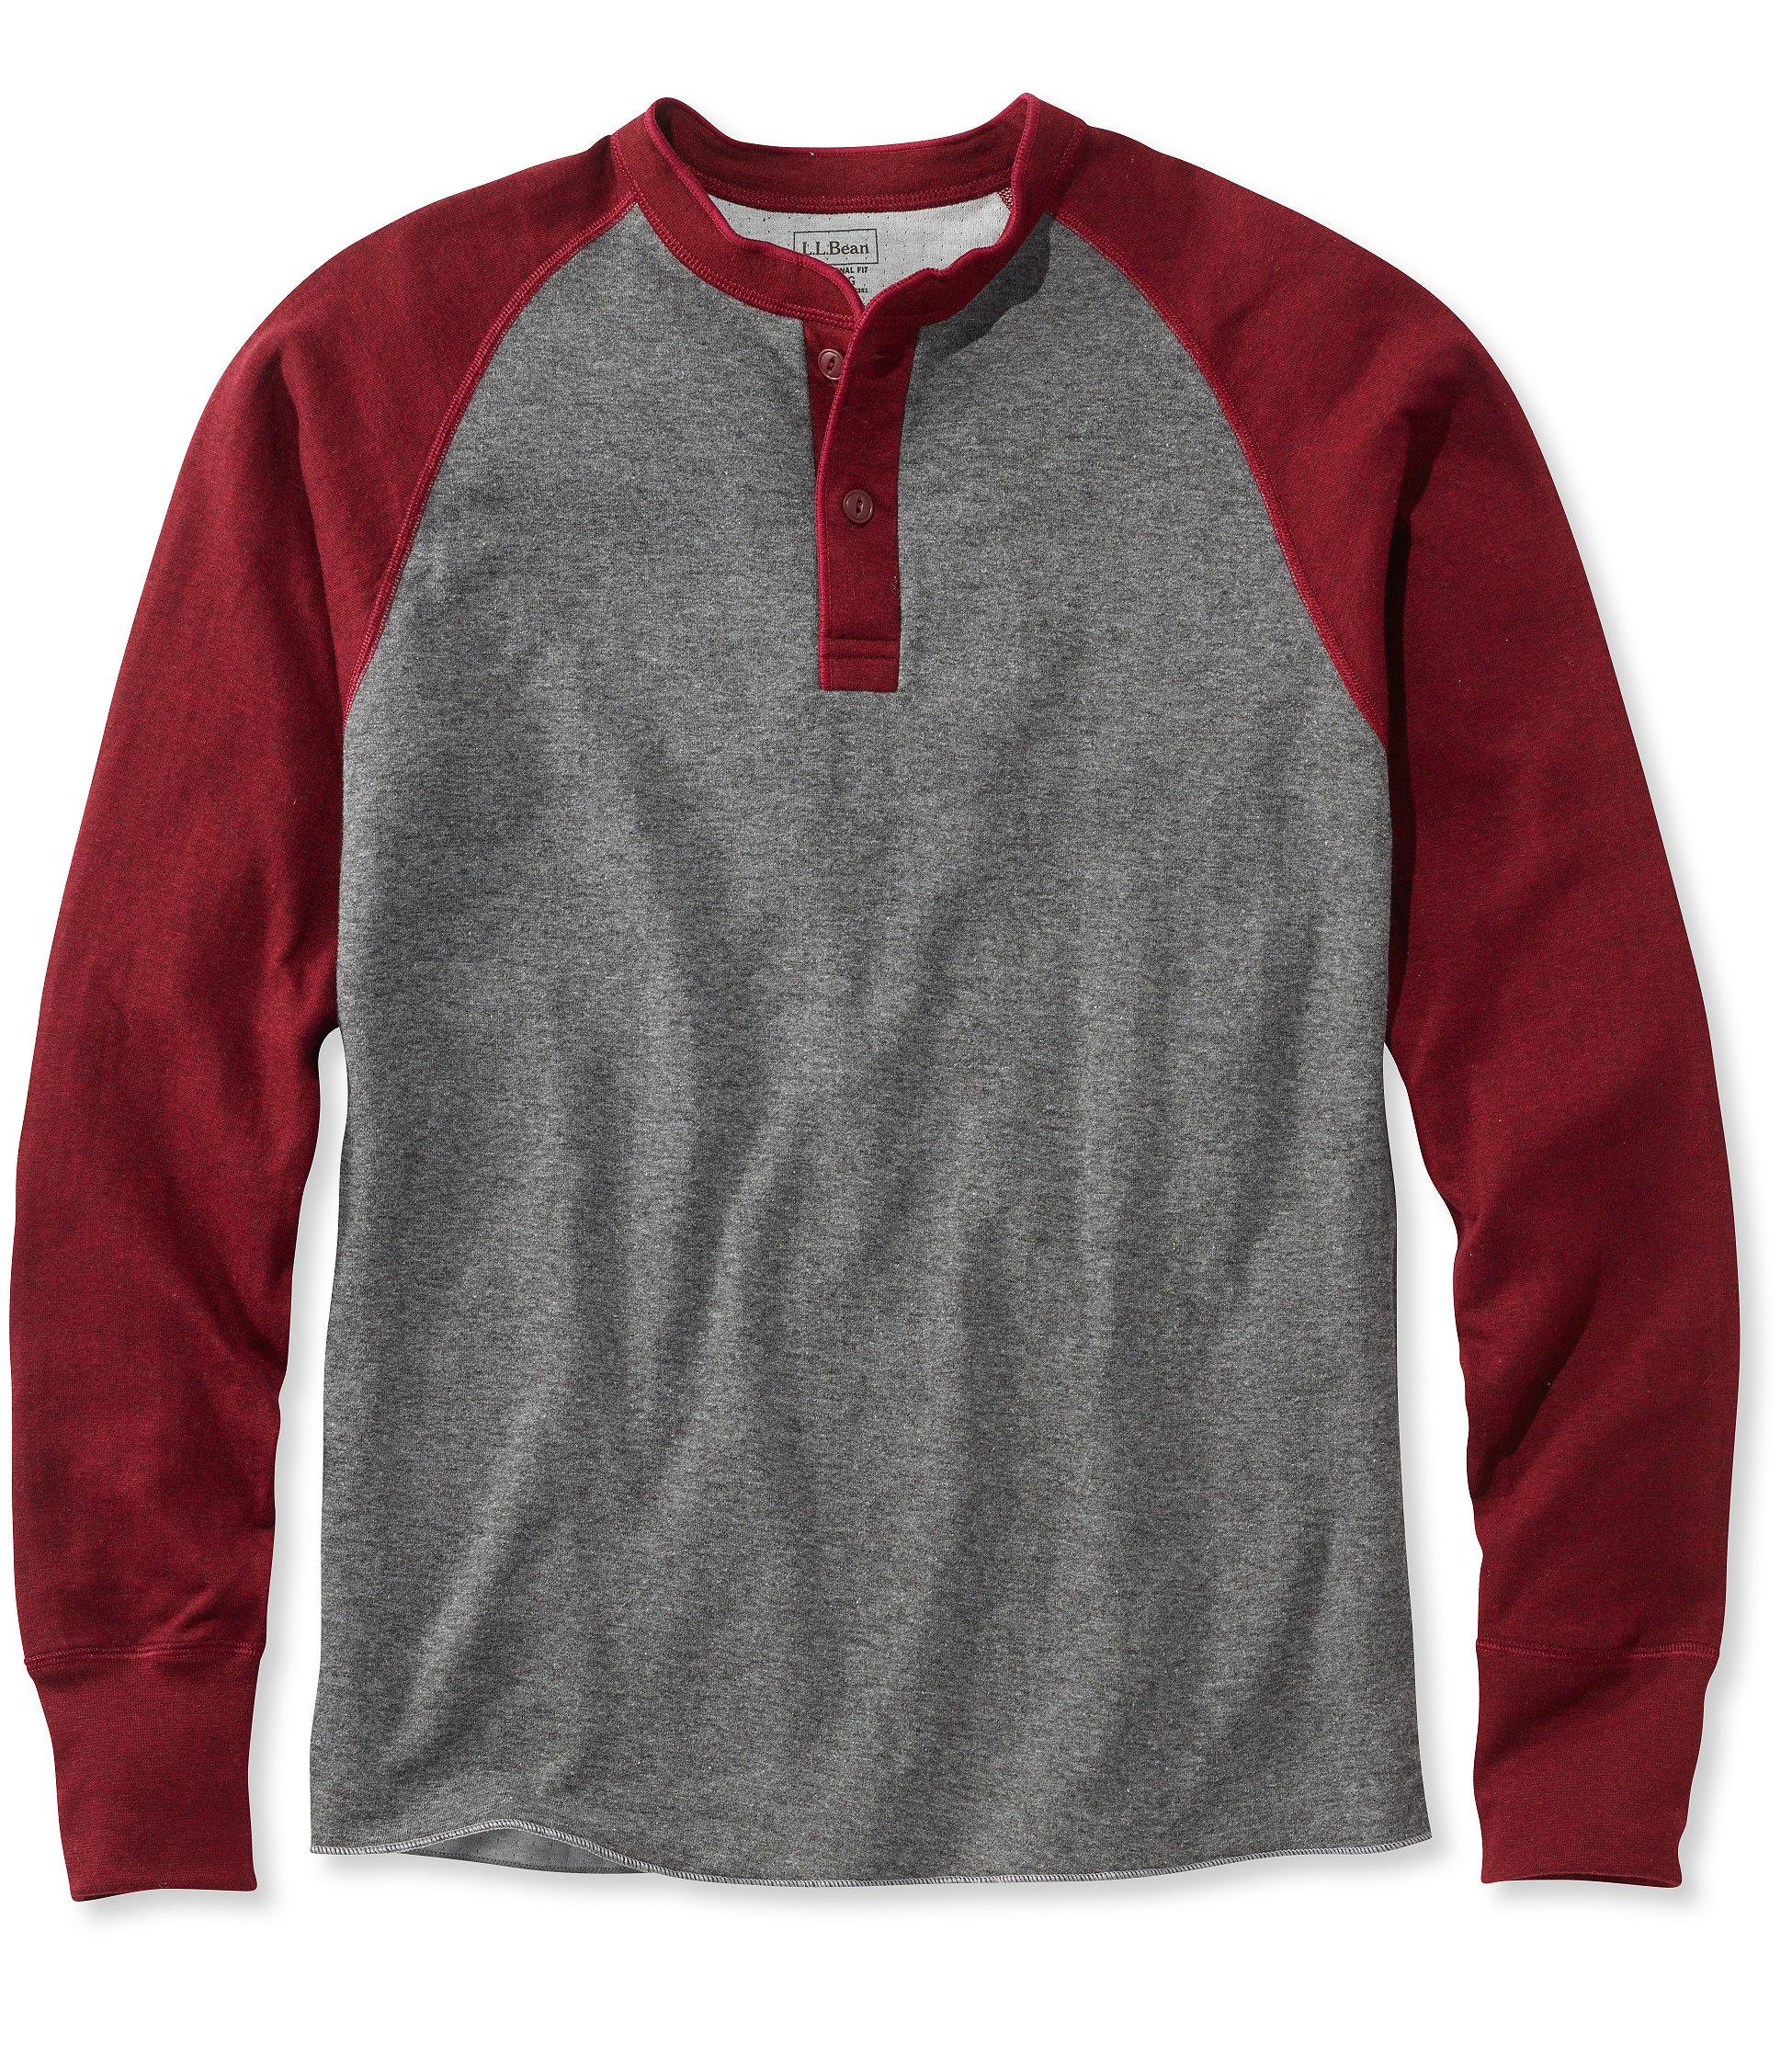 L.L.Bean Two-Layer River Driver's Shirt